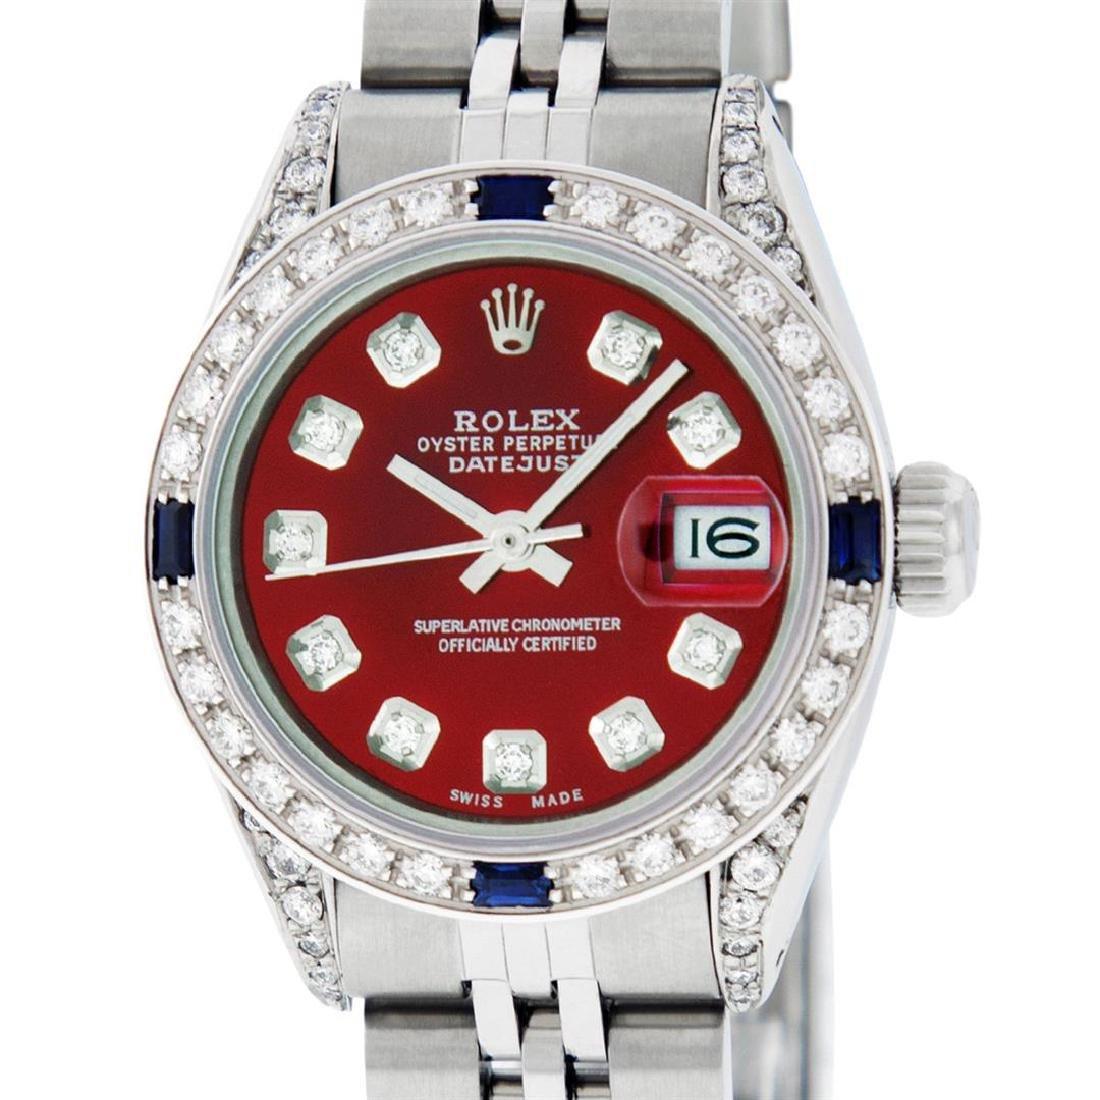 Rolex Ladies Stainless Steel Diamond Lugs & Sapphire